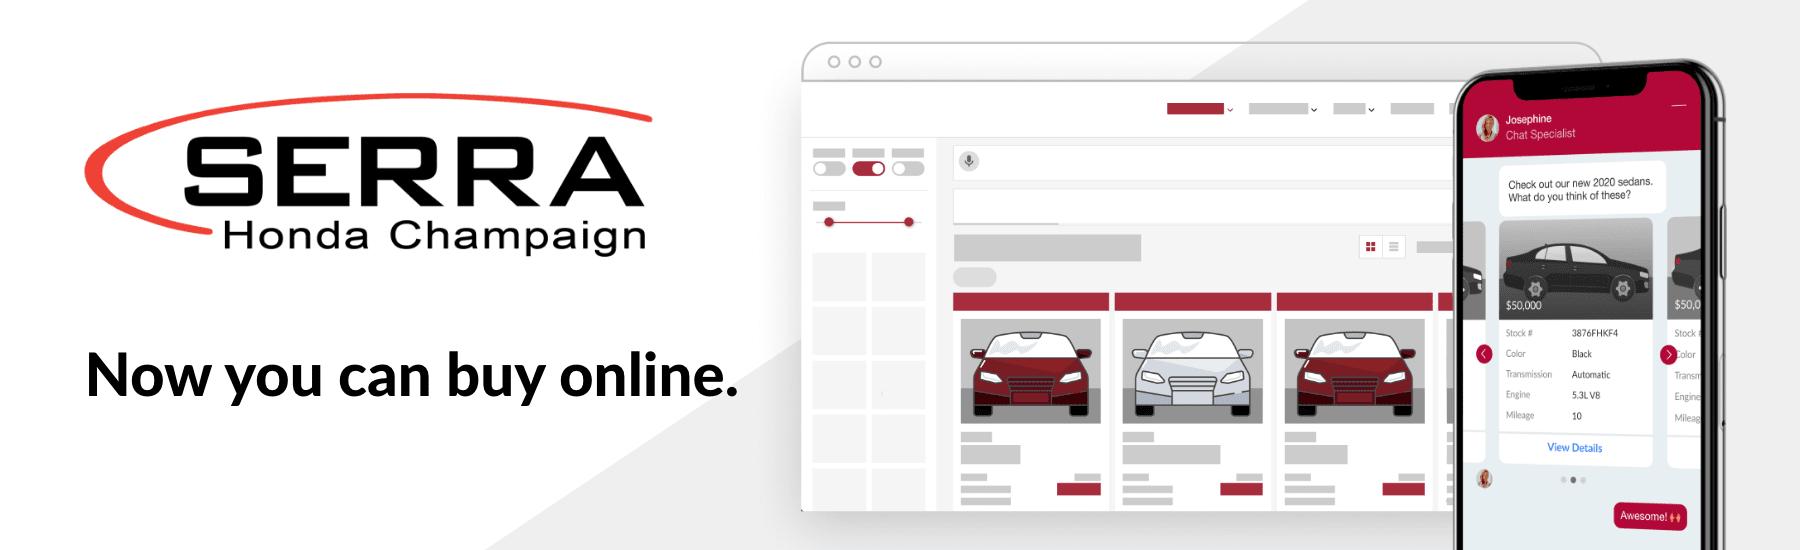 Serra Honda Champaign - Buy Online